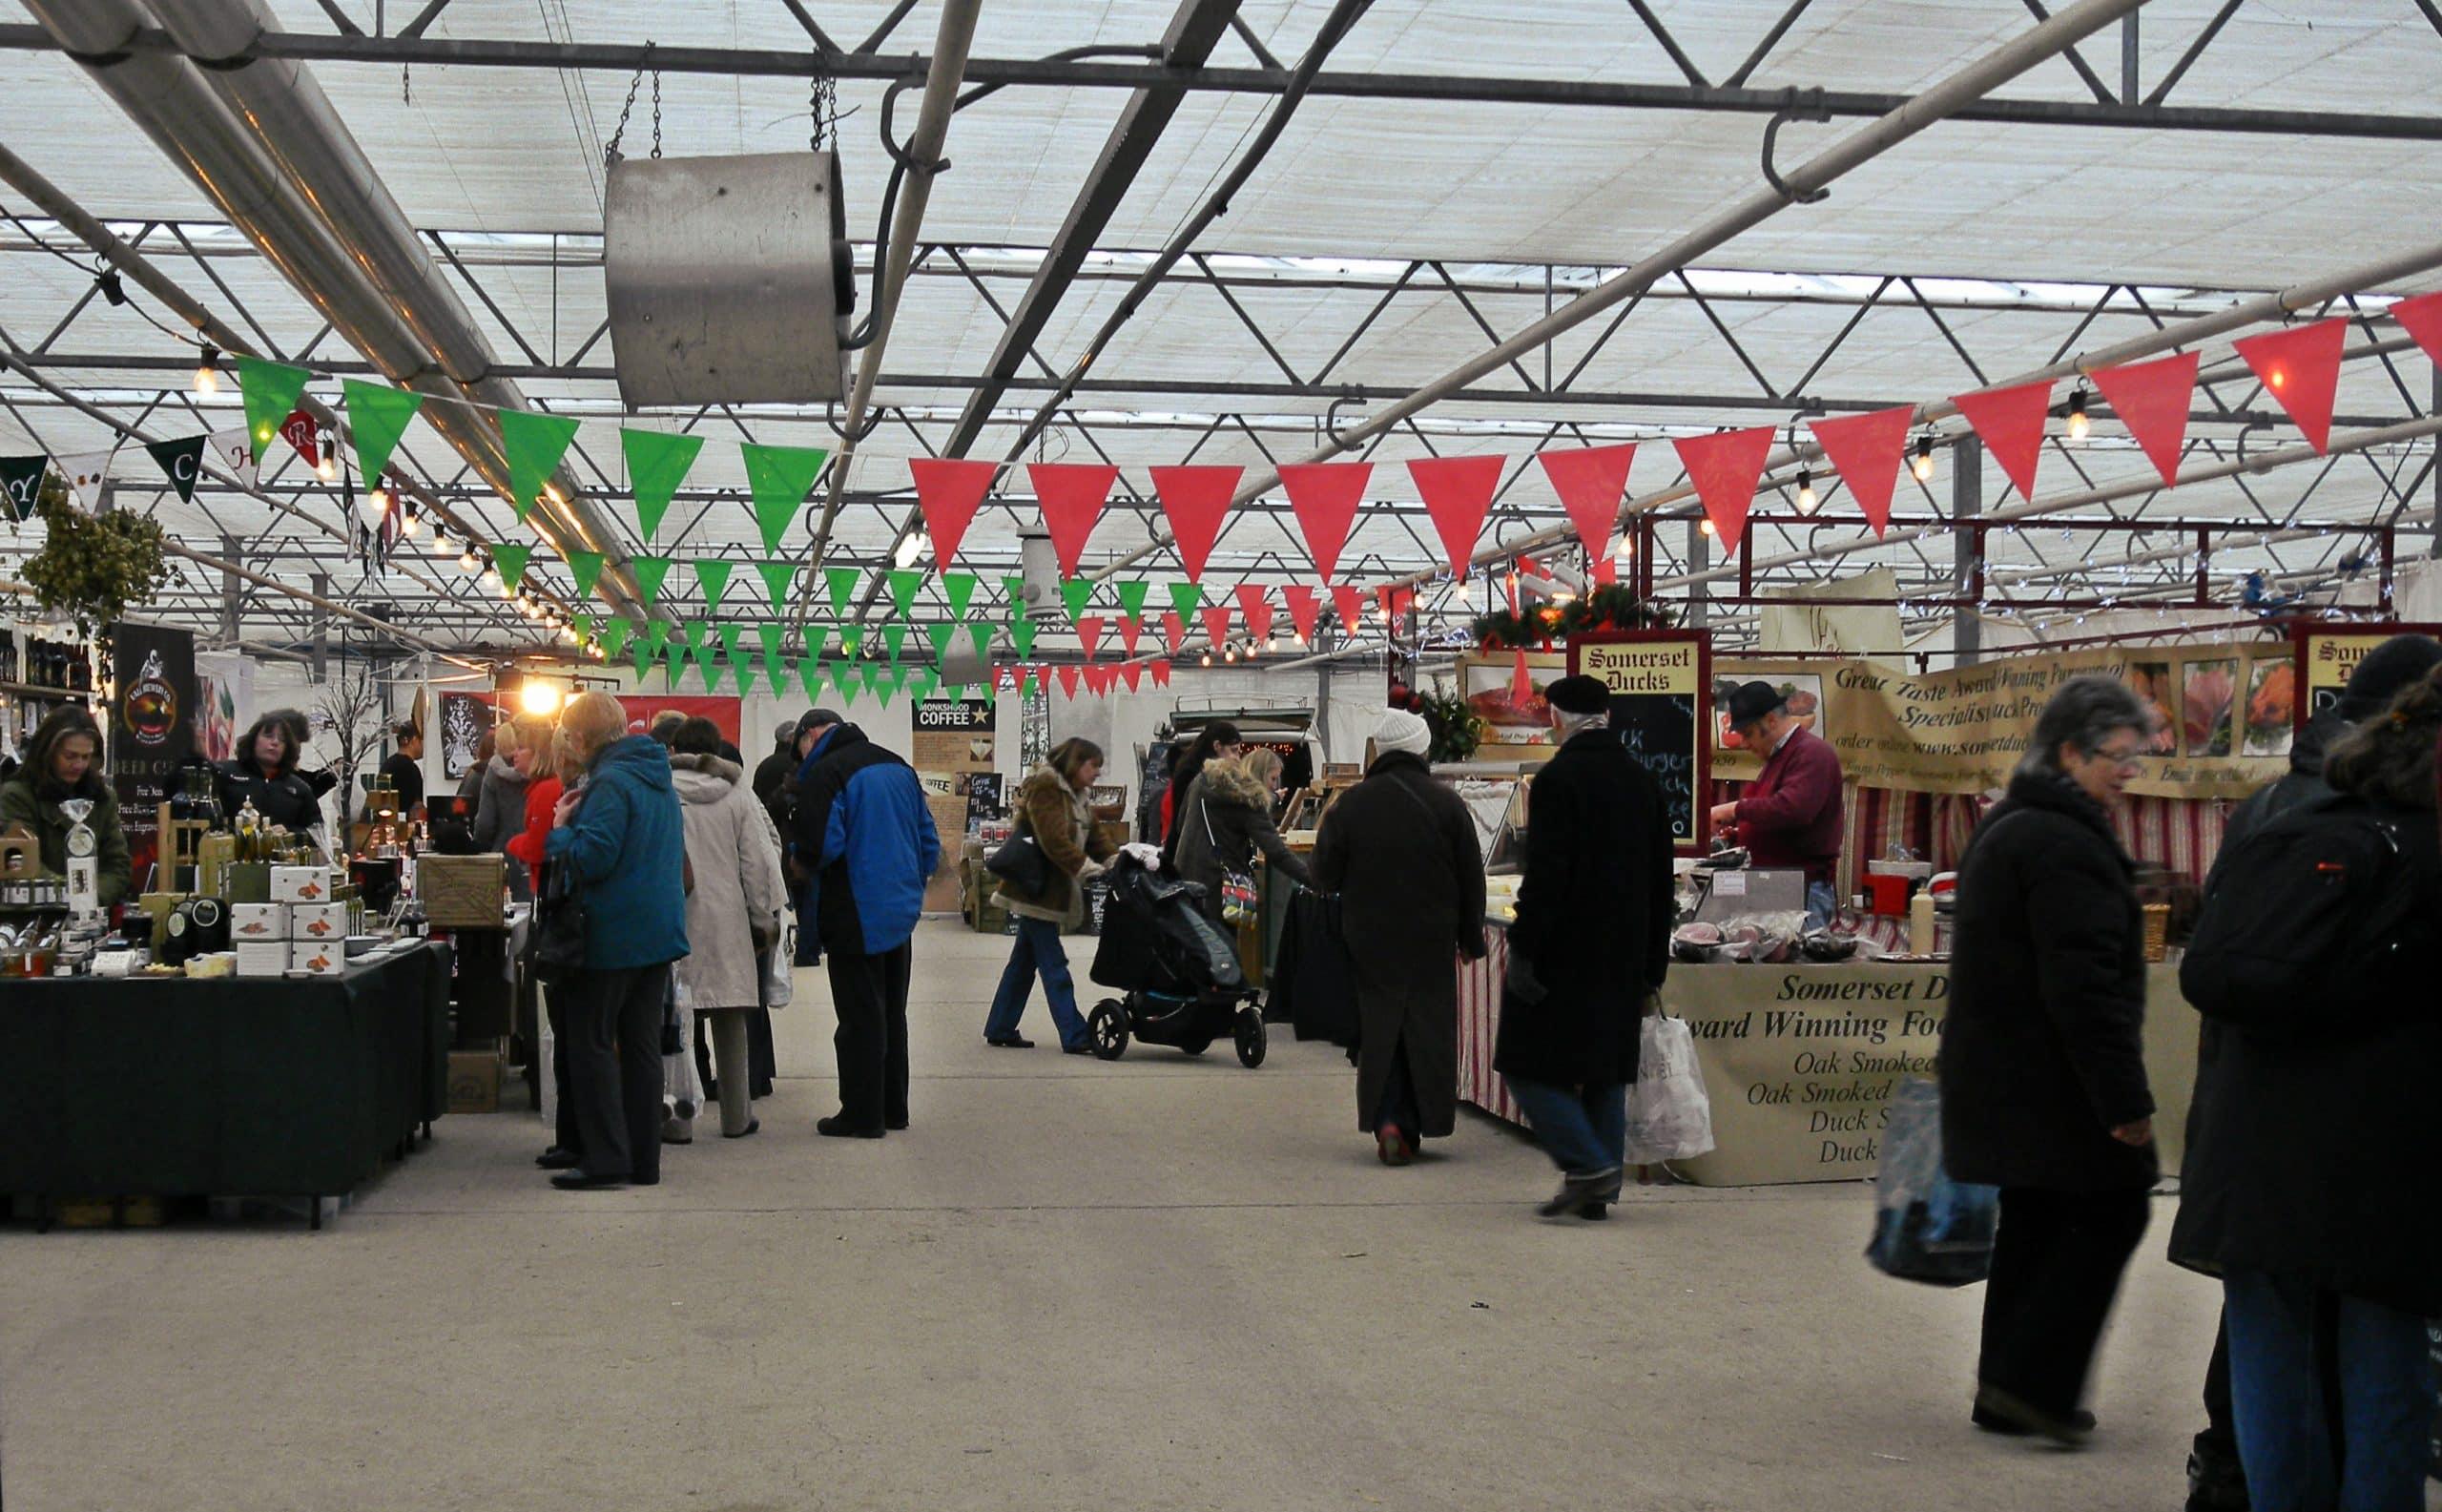 Waddesdon Manor Christmas food market